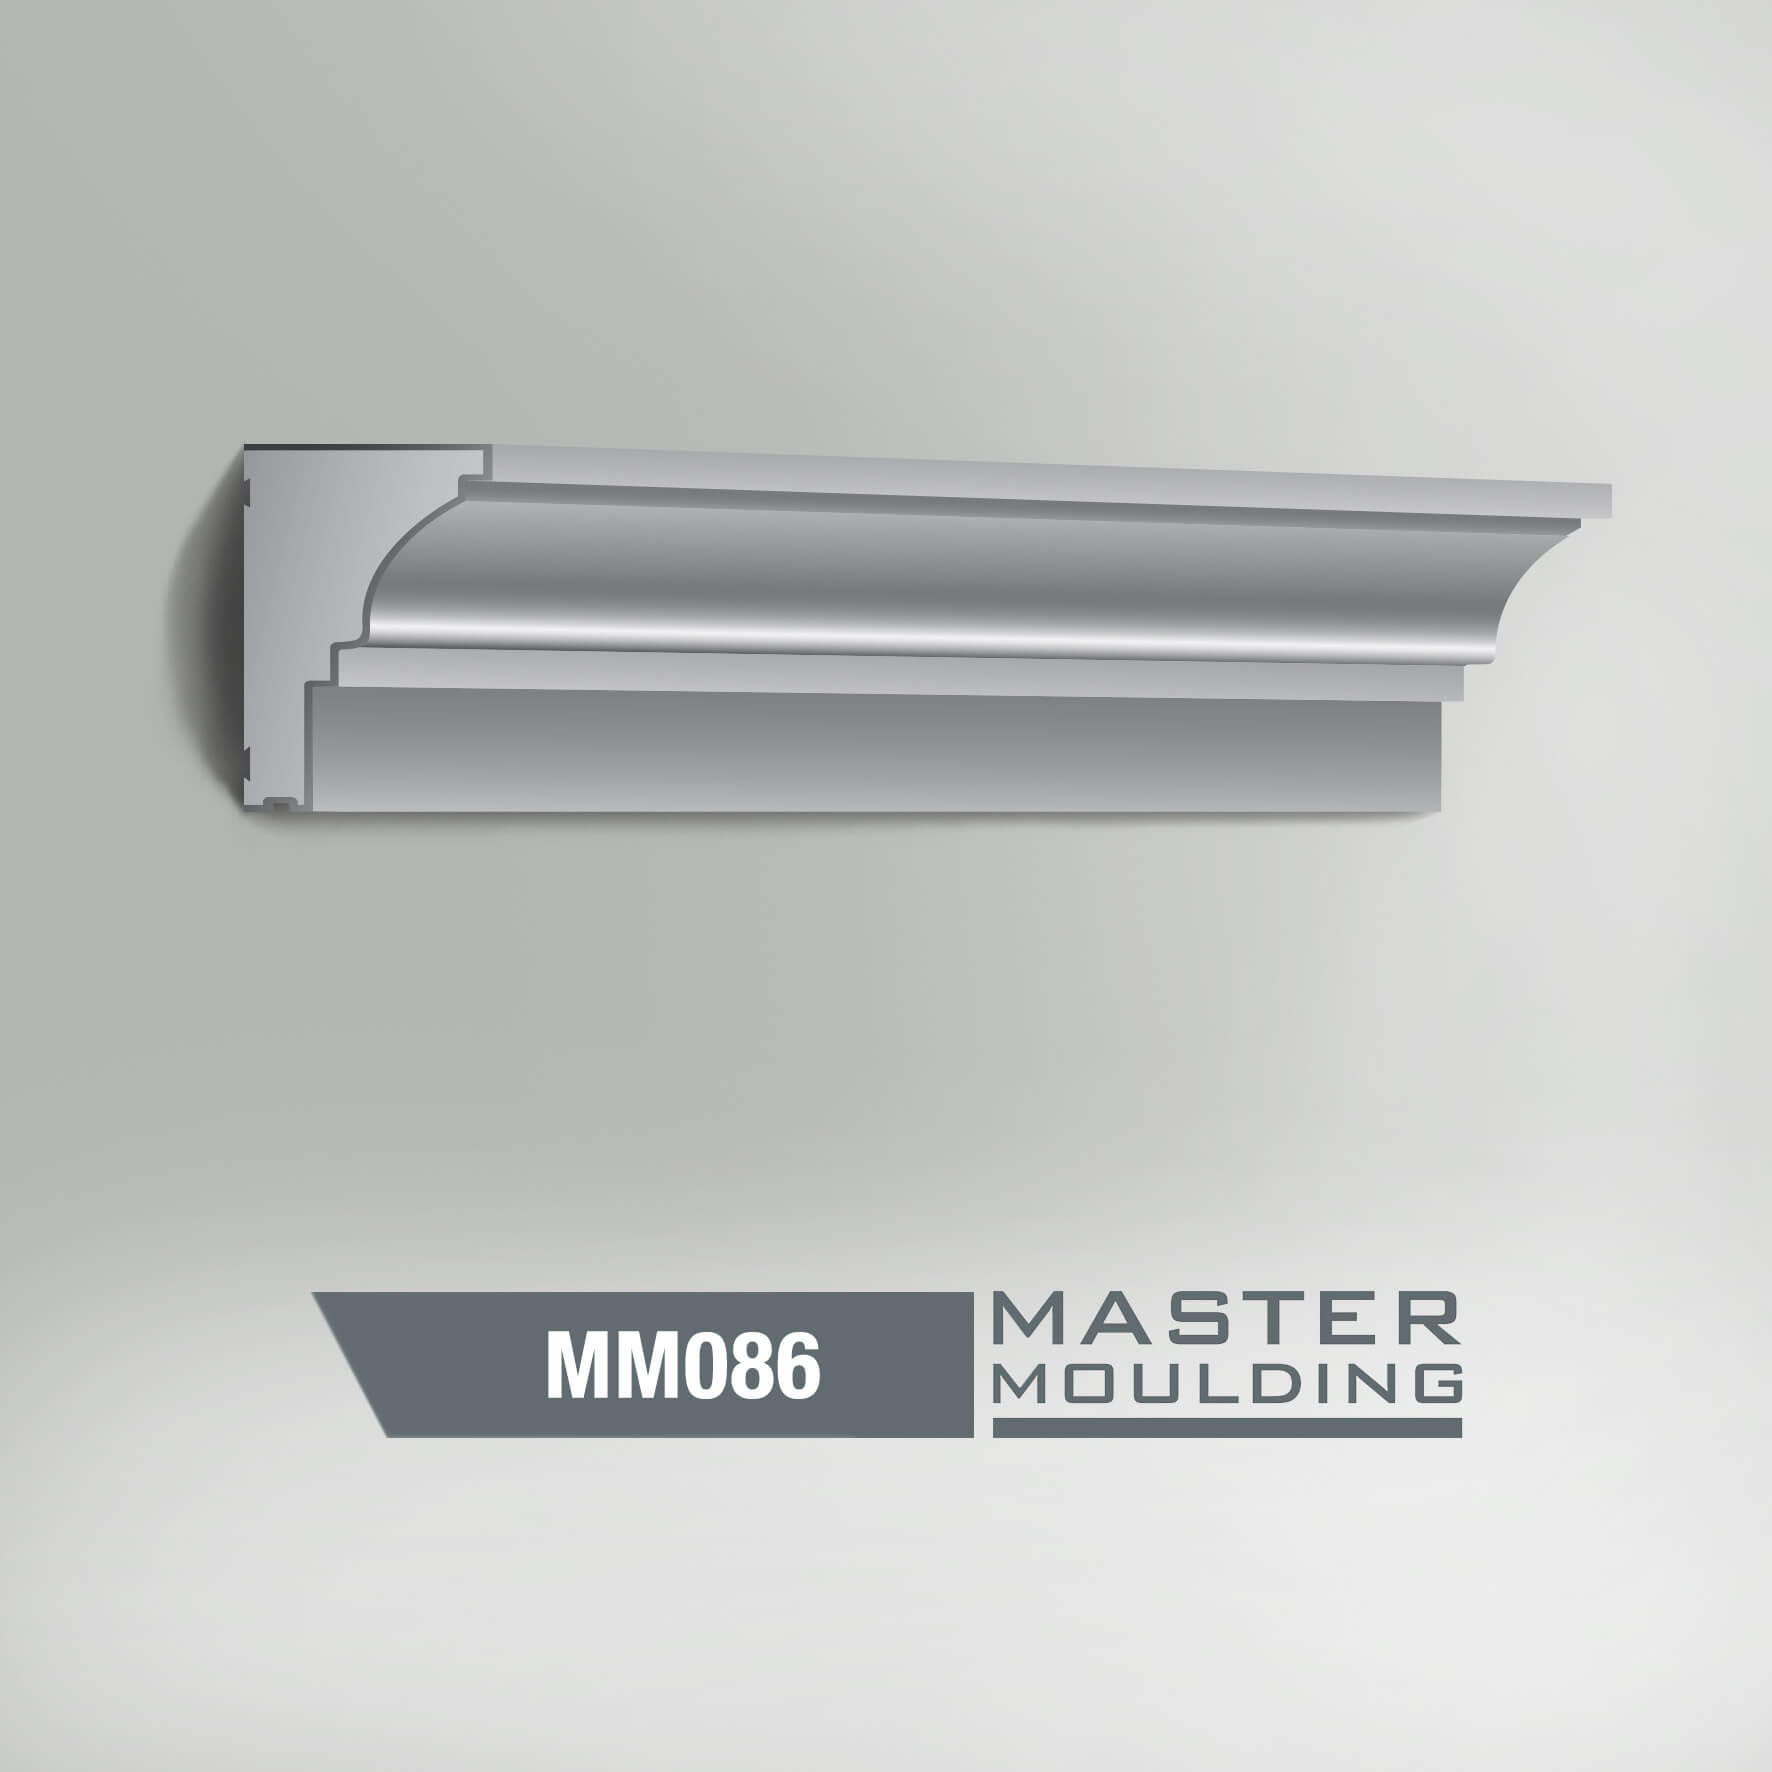 MM086